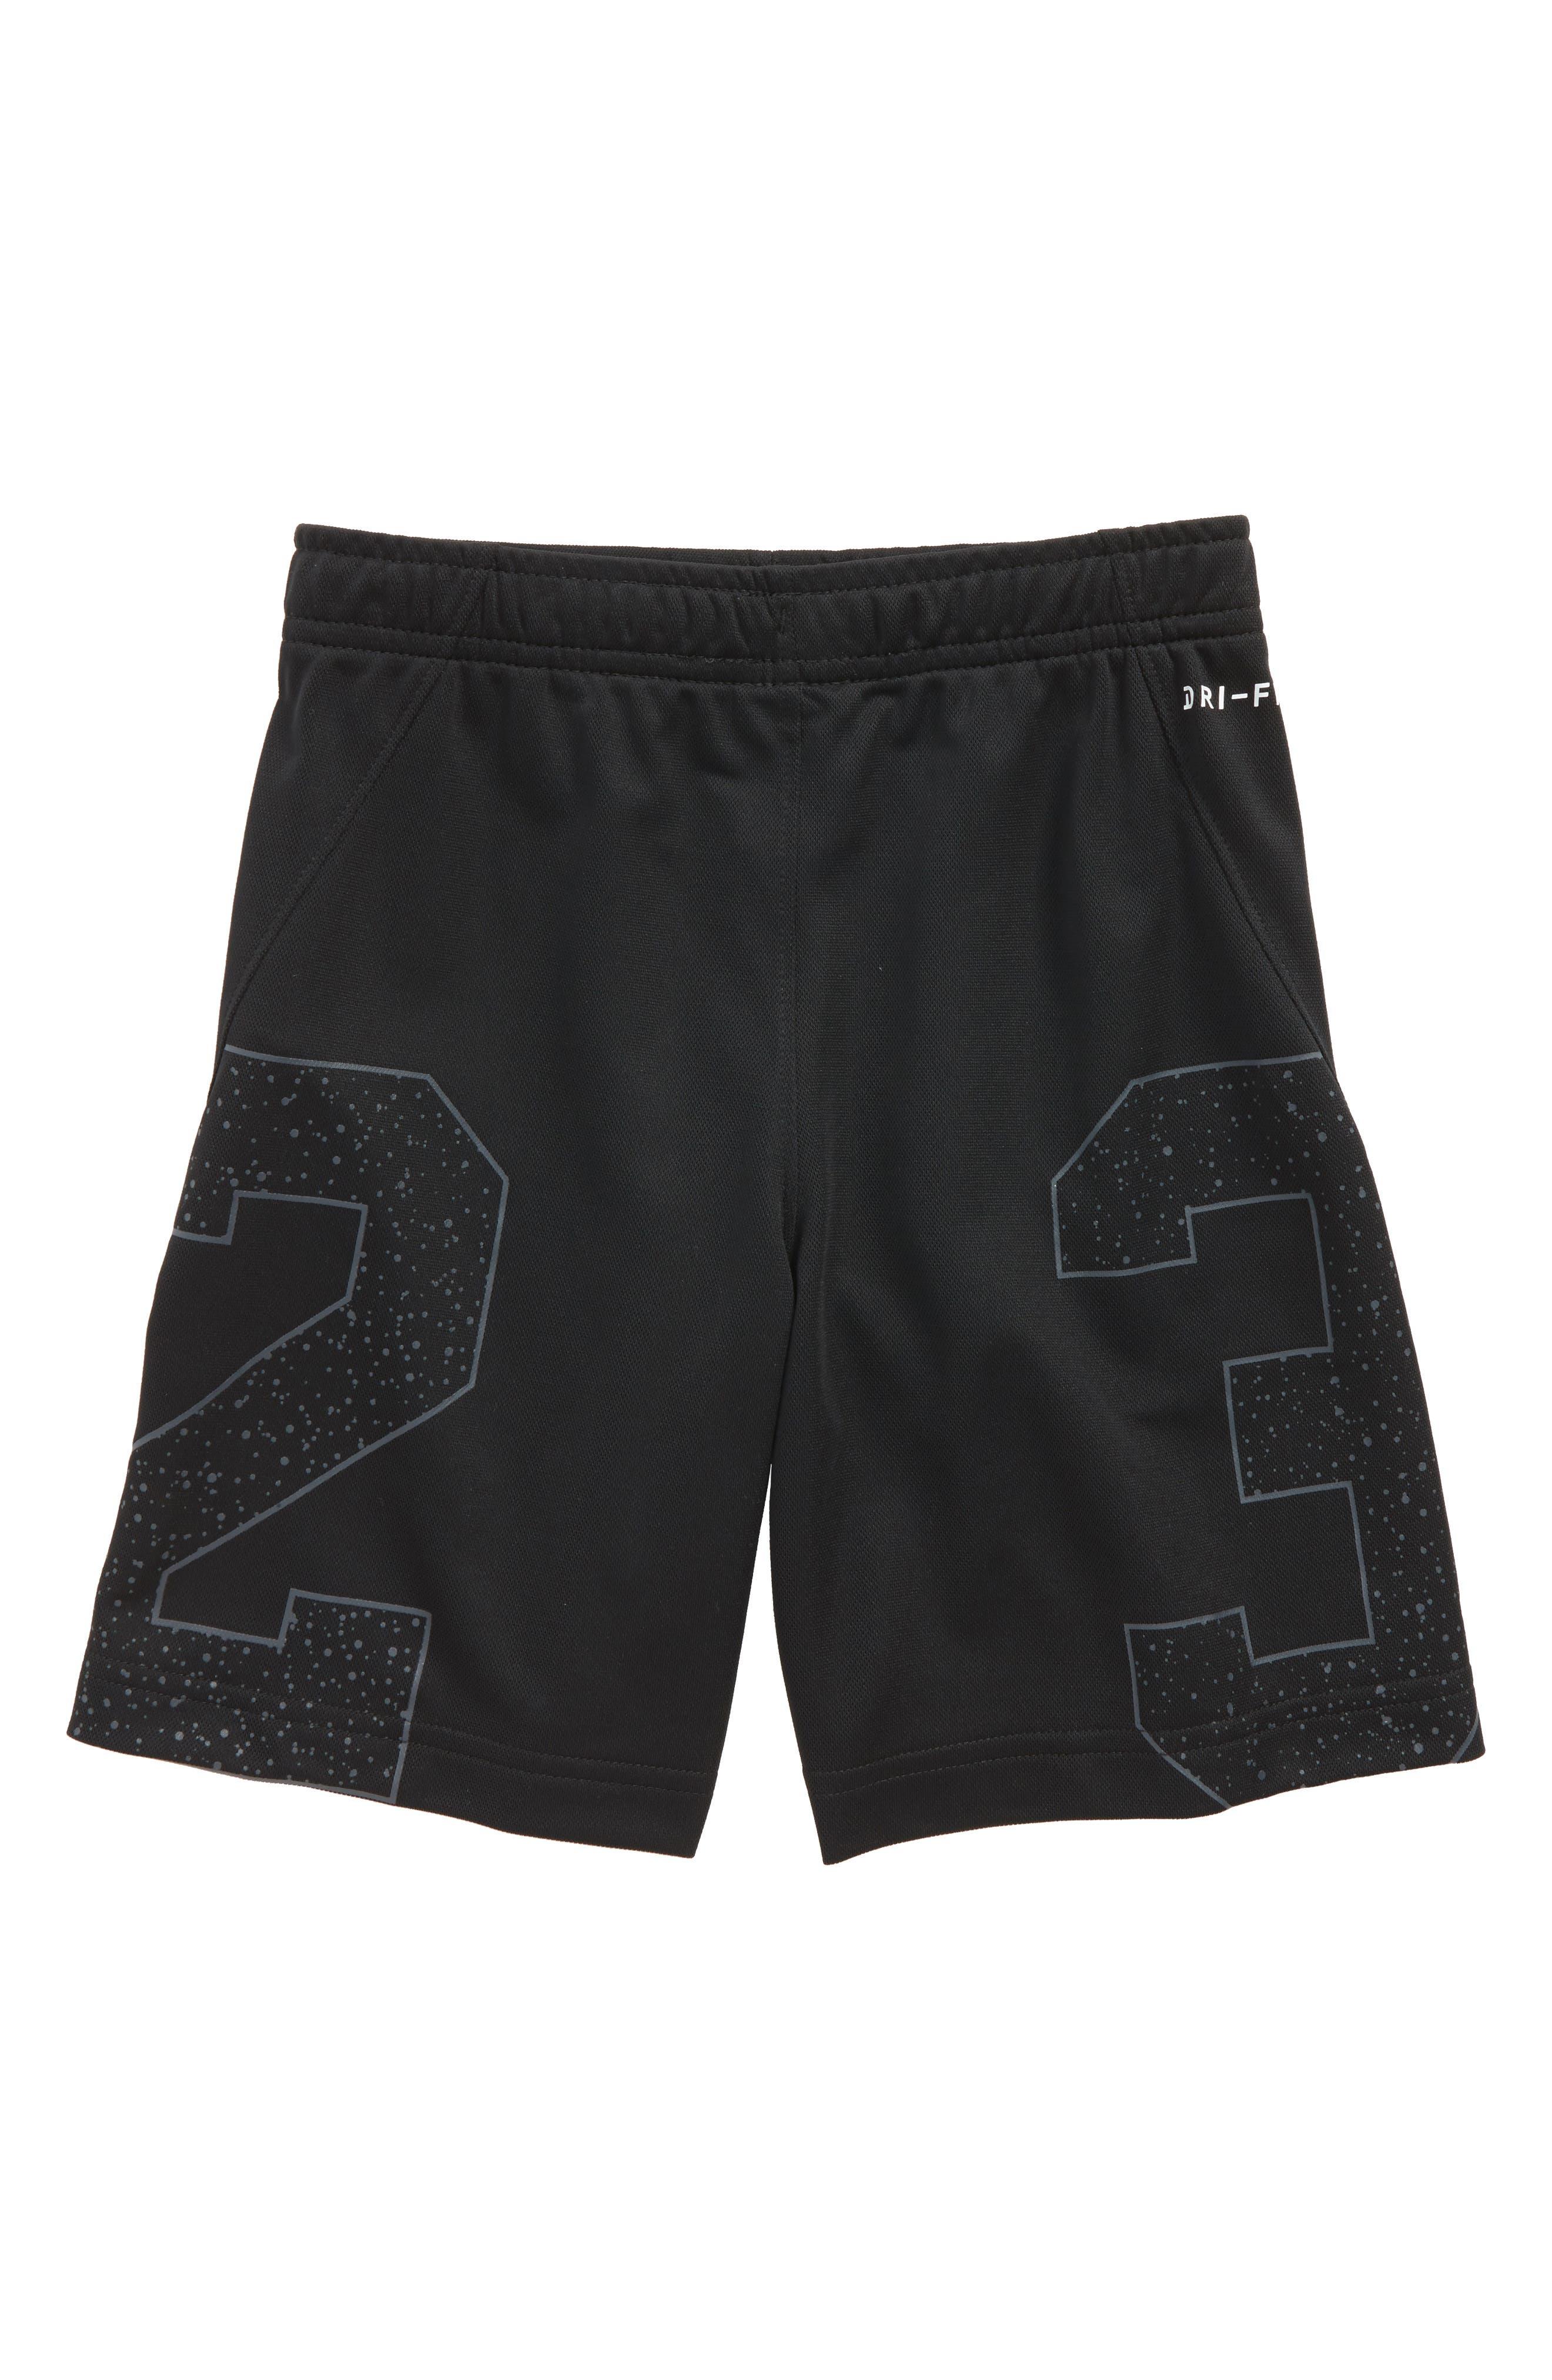 Jordan Dry Speckle 23 Training Shorts,                             Alternate thumbnail 2, color,                             Black